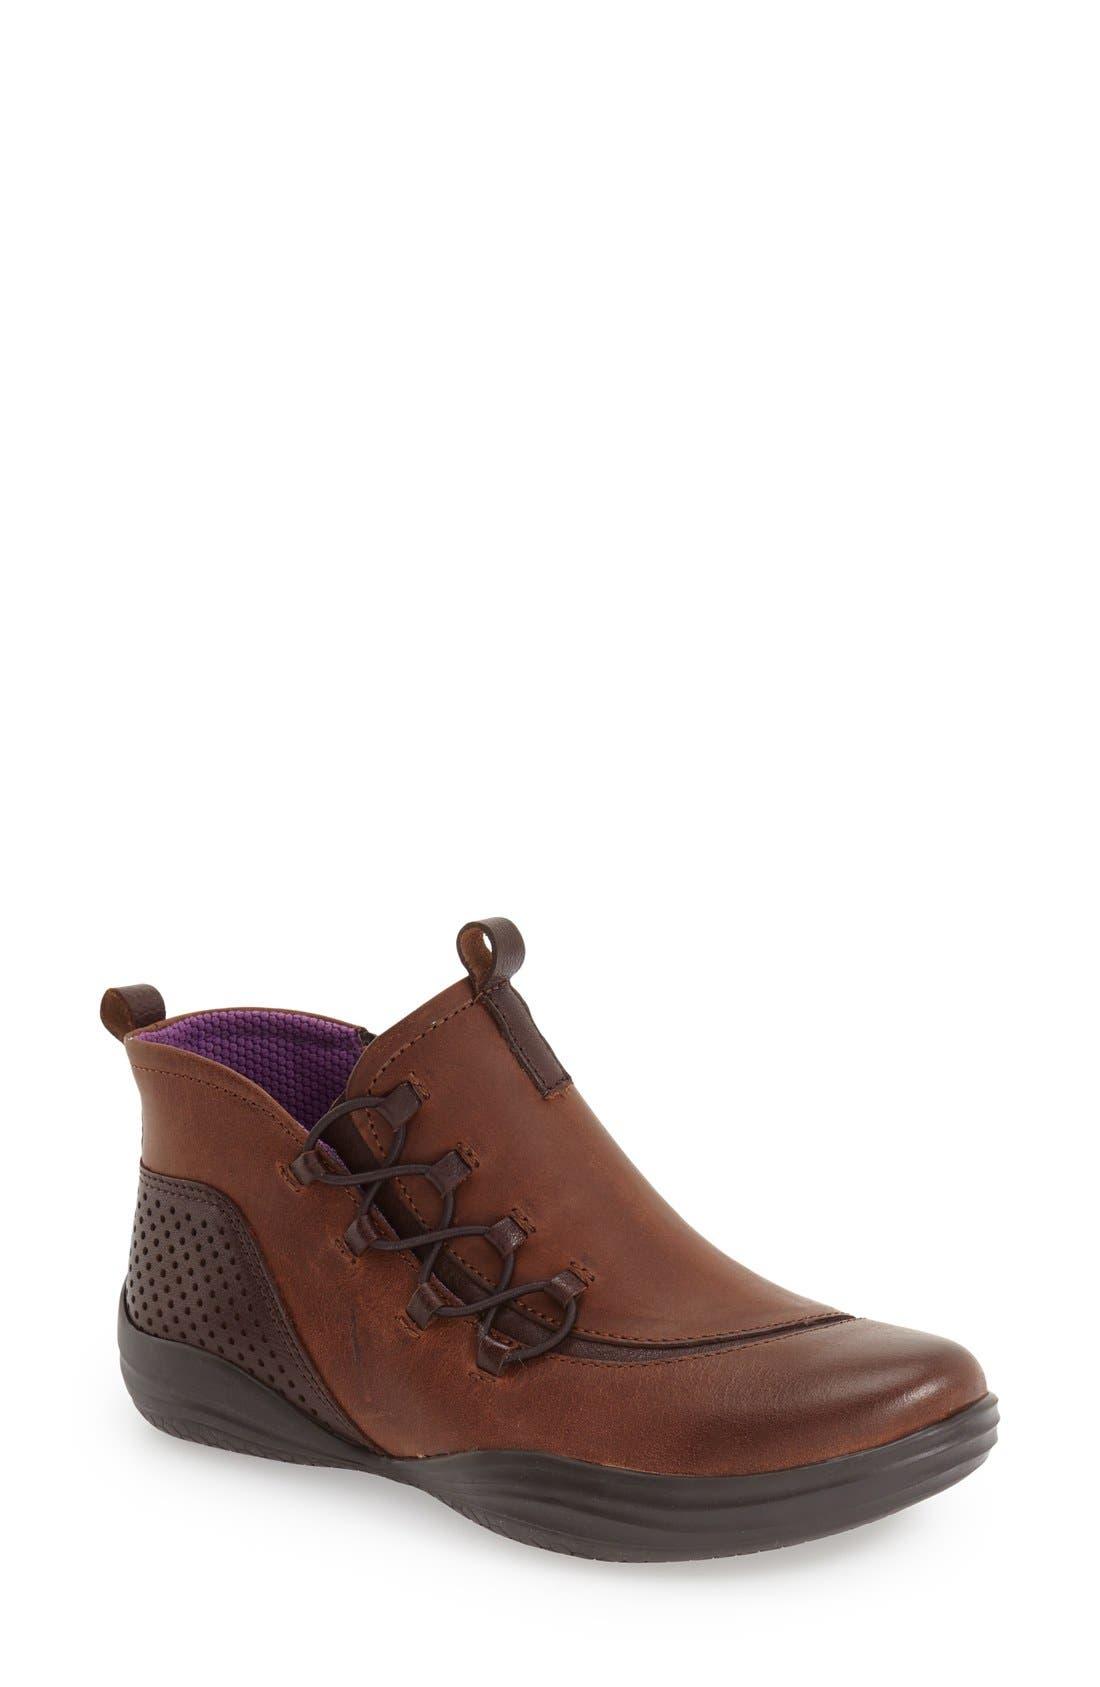 'Santiago' Bootie,                         Main,                         color, Mahogany Oiled Nubuck Leather